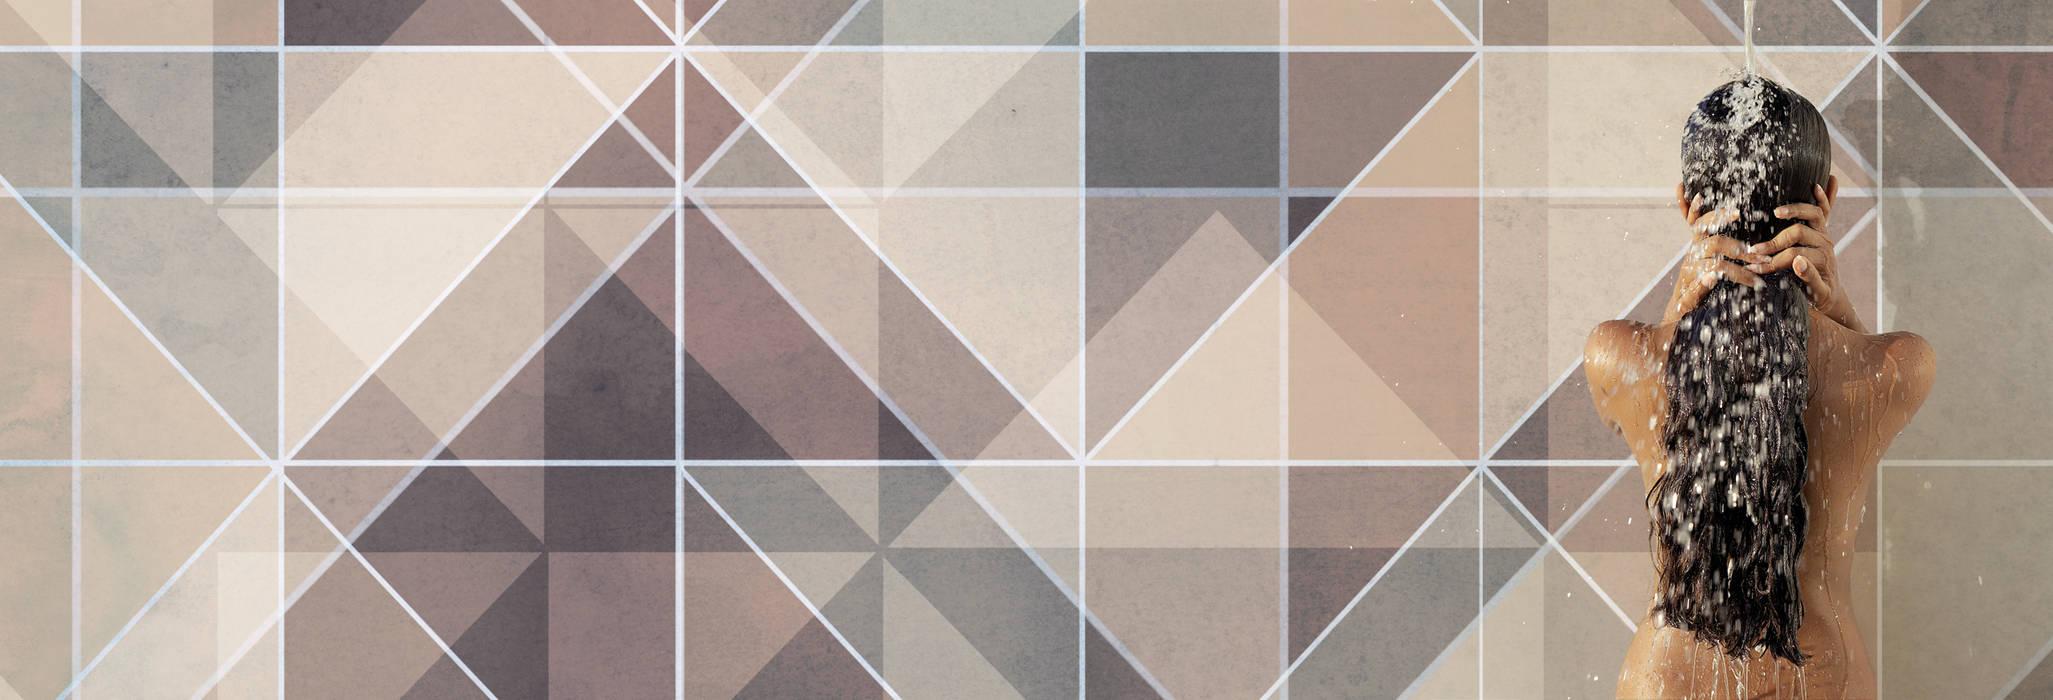 BandIt Design Walls & flooringWallpaper Multicolored